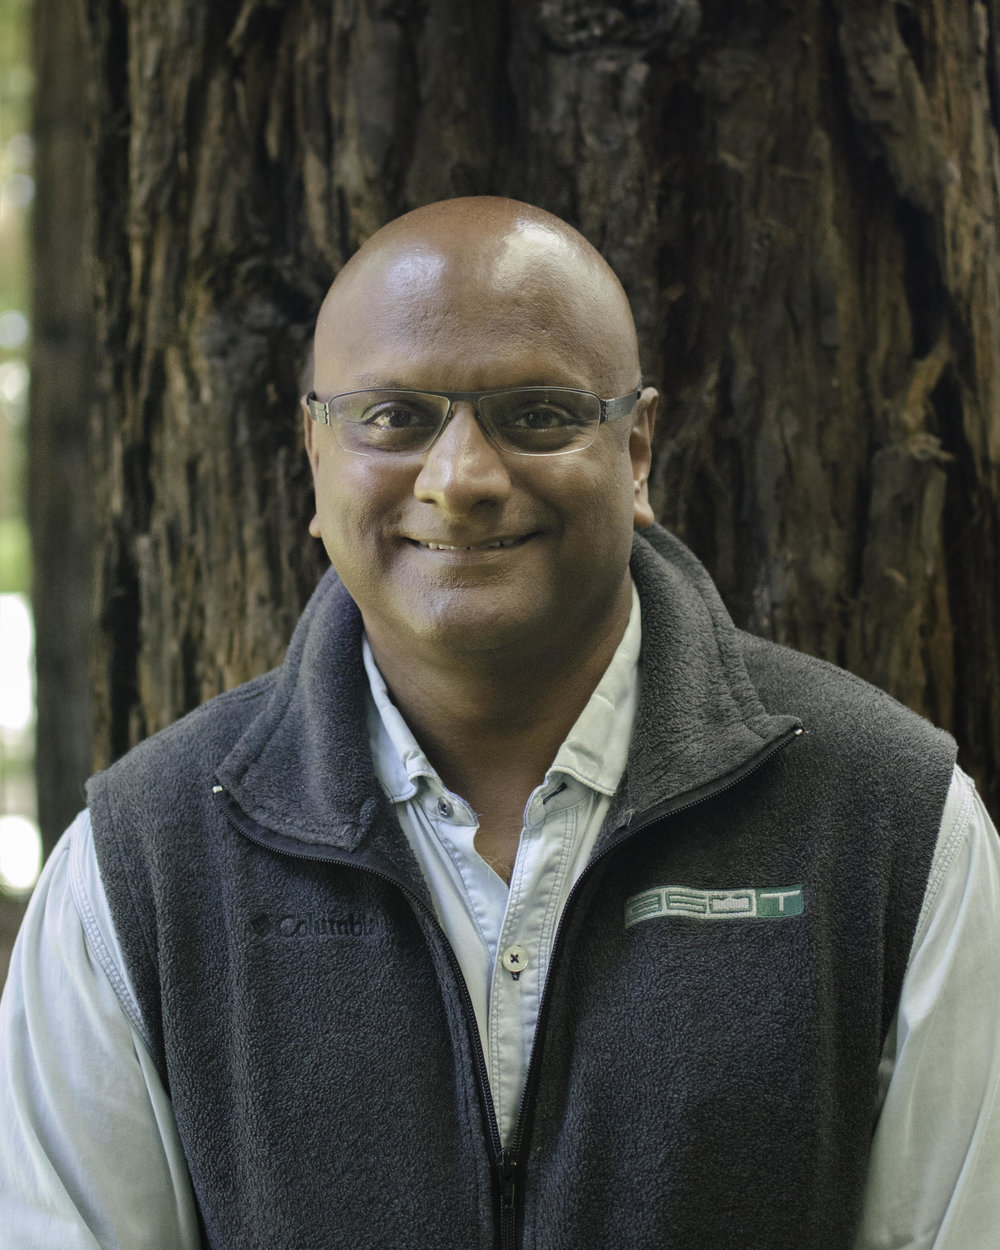 Raja Ramachandran, Ripe.io